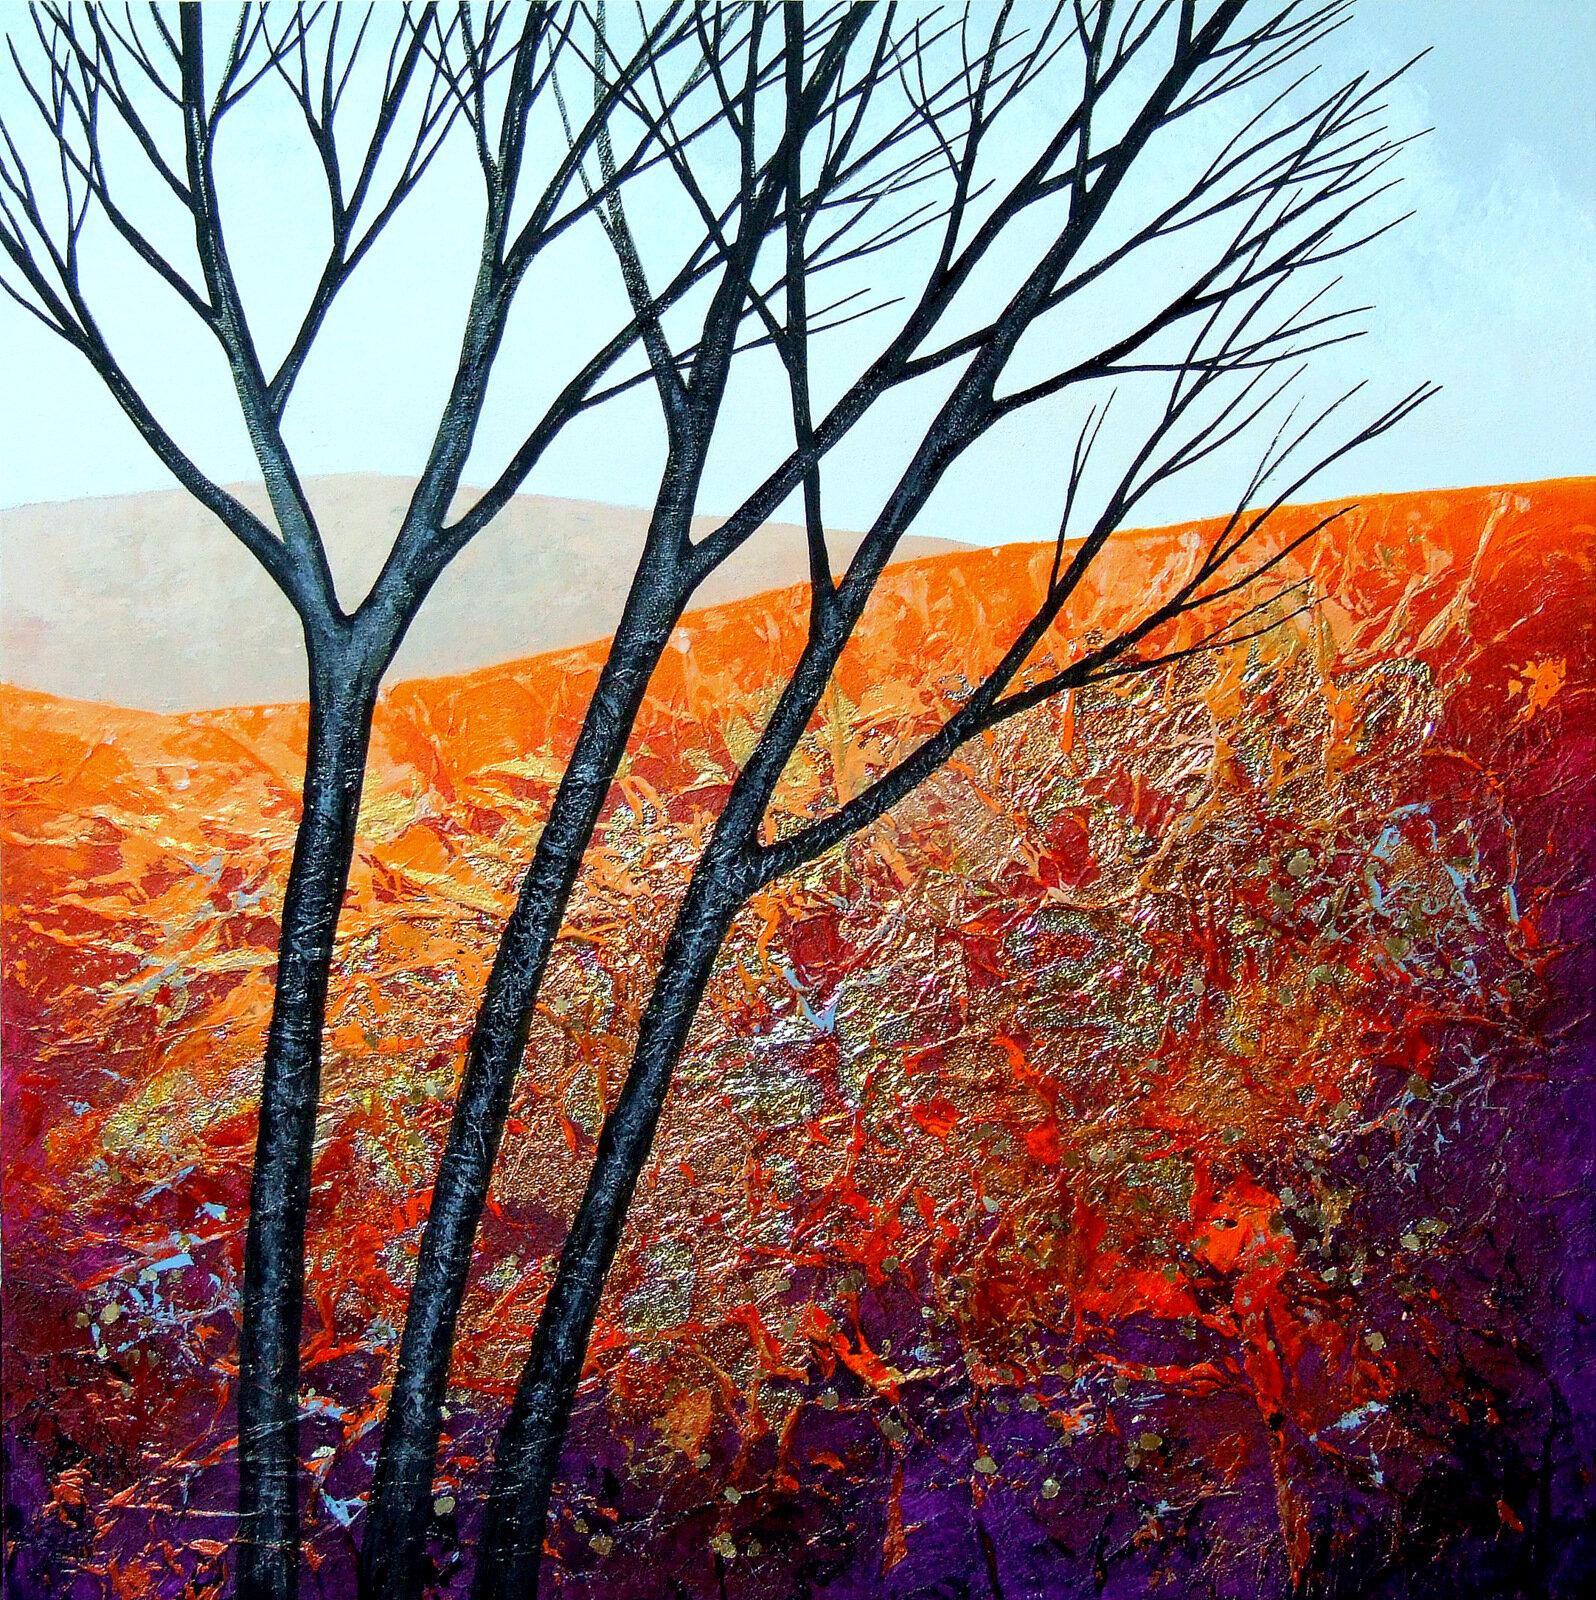 The Burnished Autumn II  acrylic  SOLD